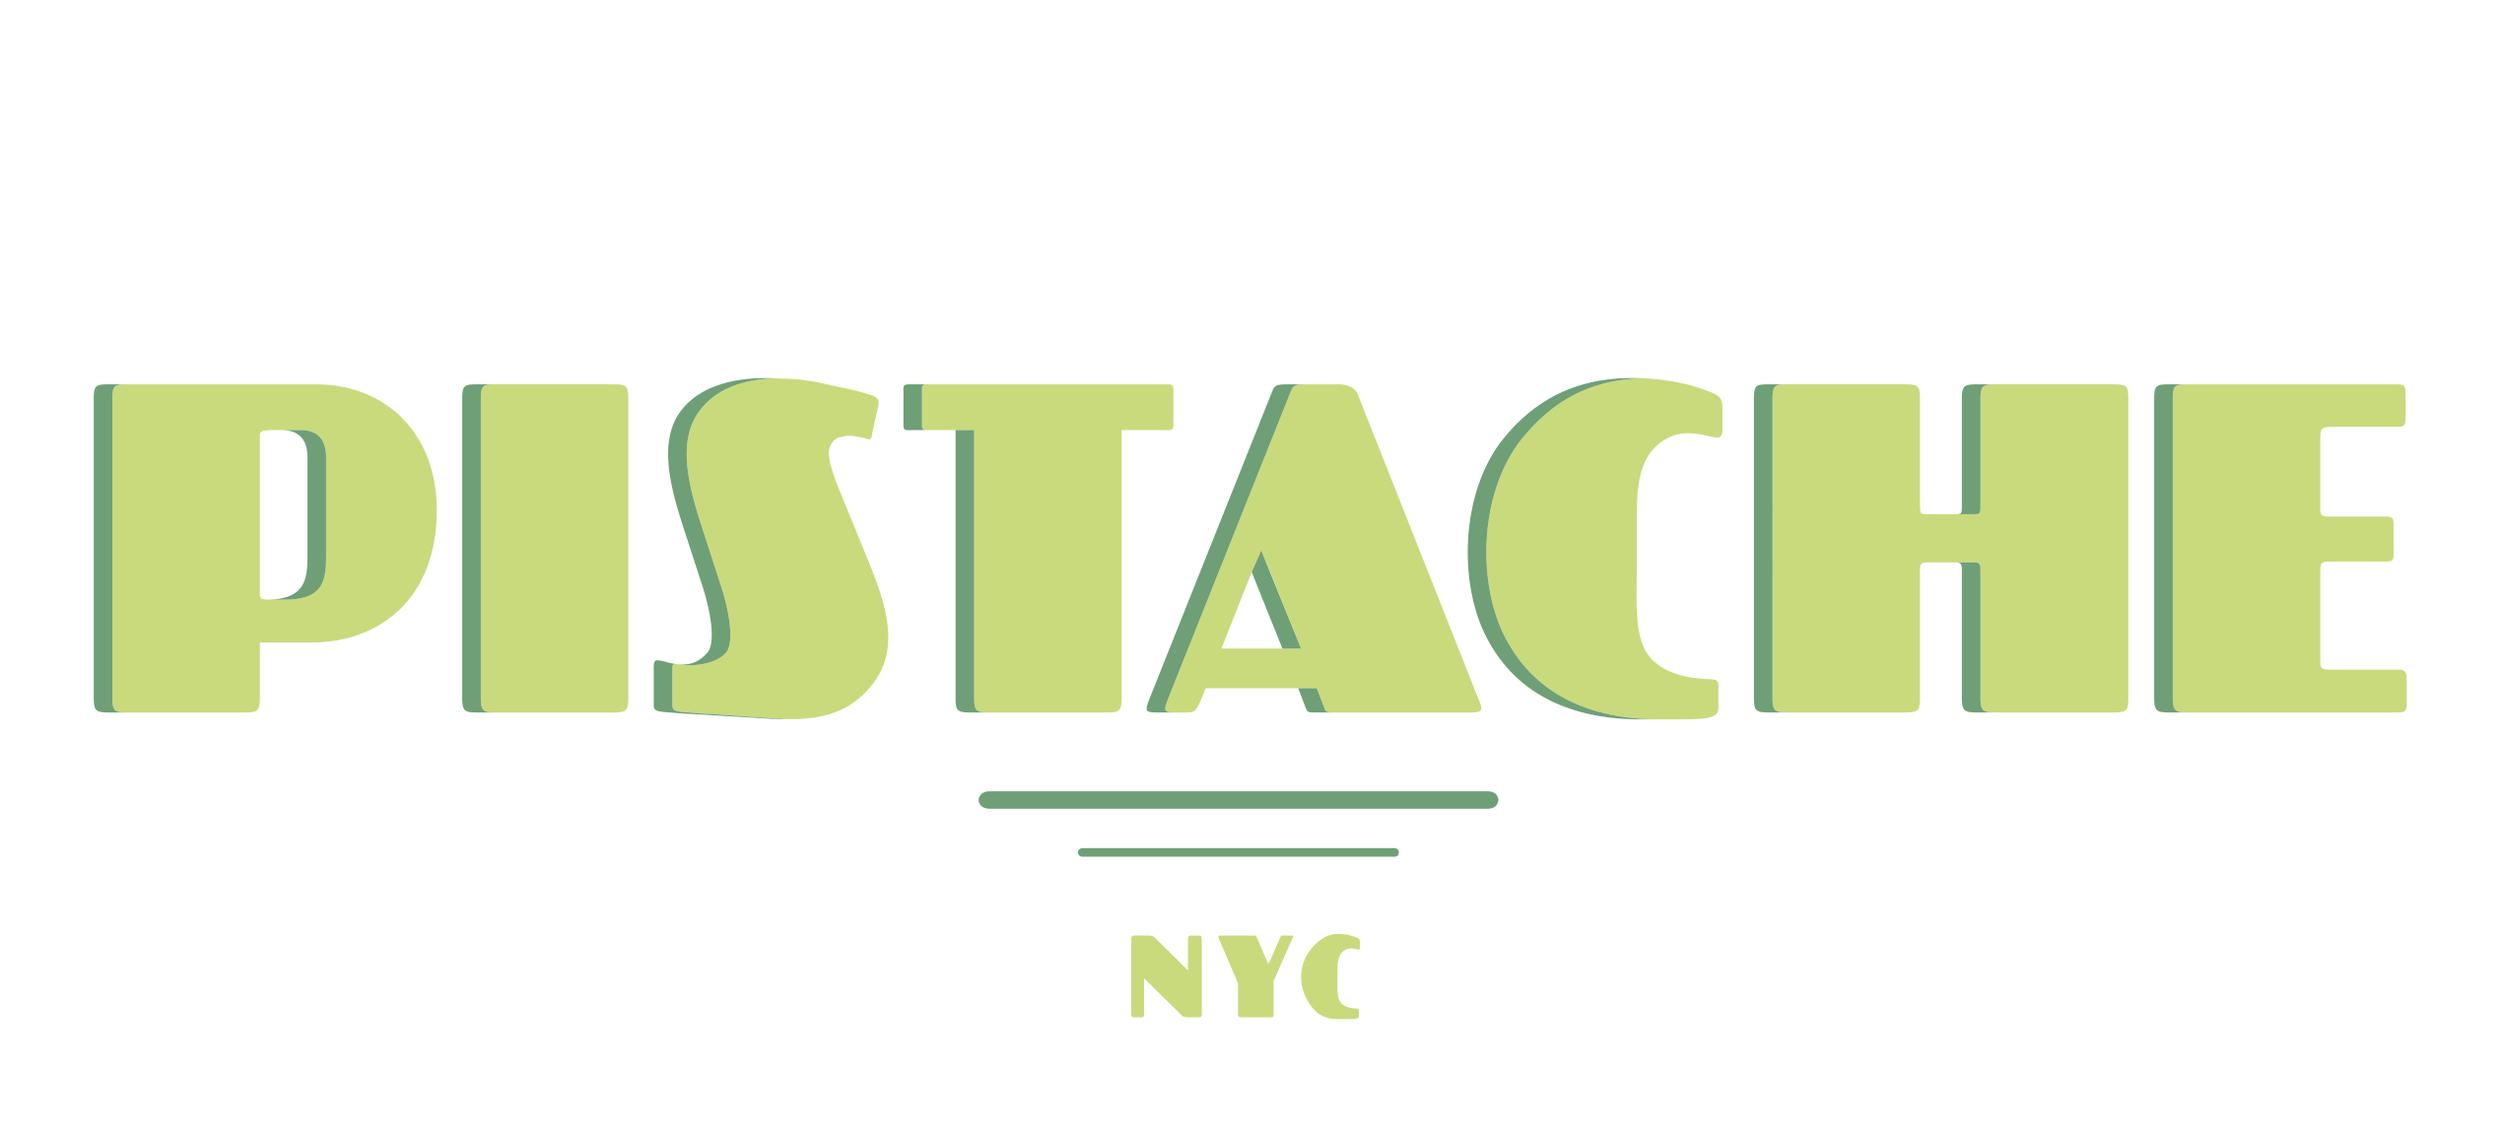 Pistache logo.jpg